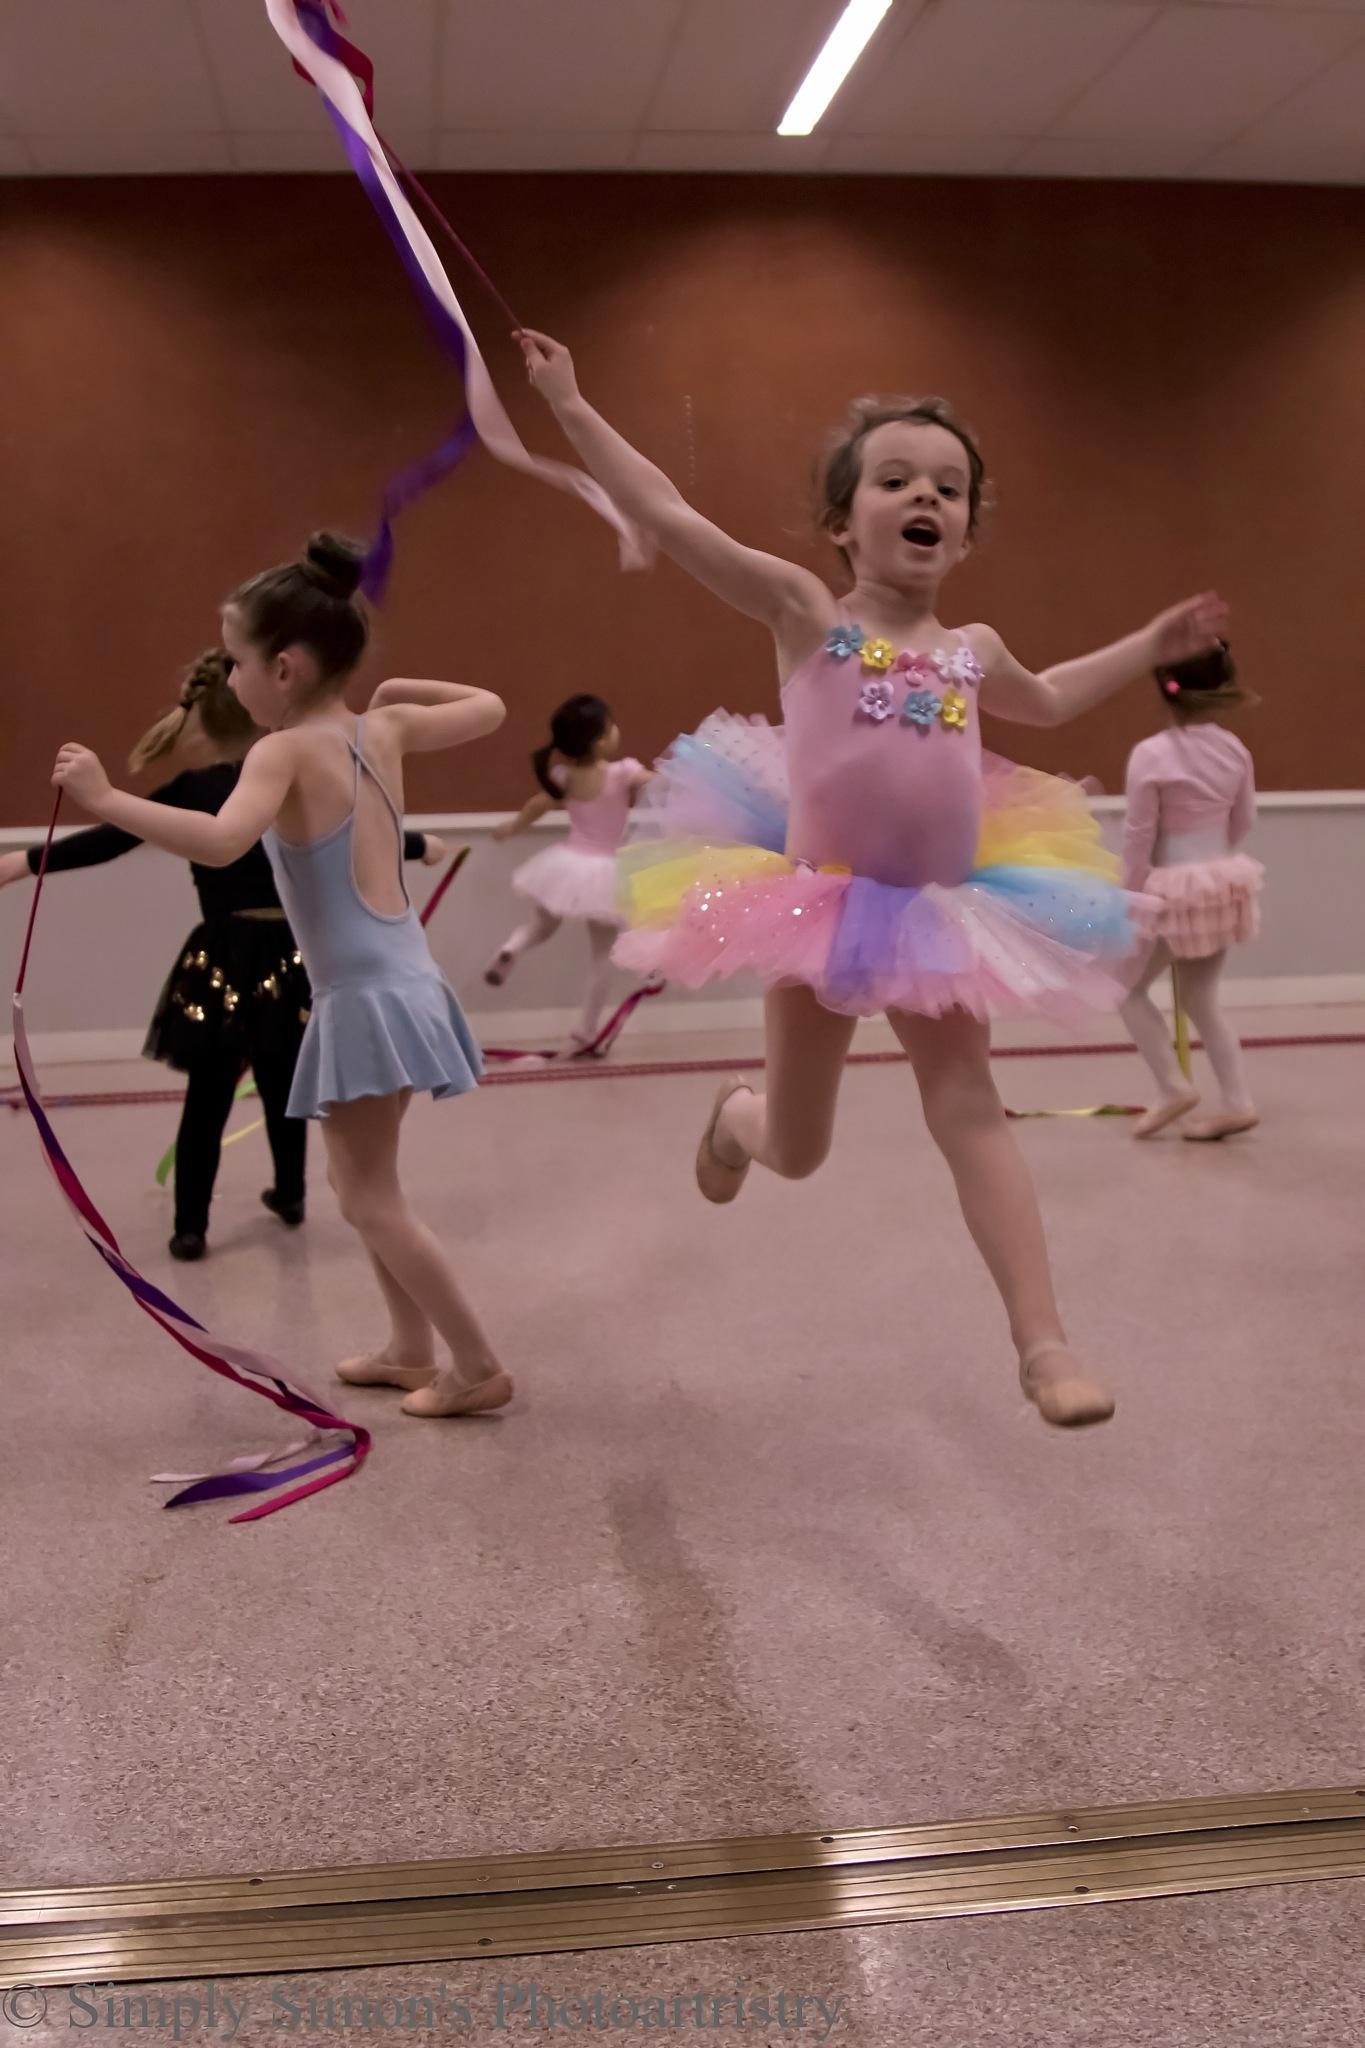 Flying Ballerina by Simon Hall